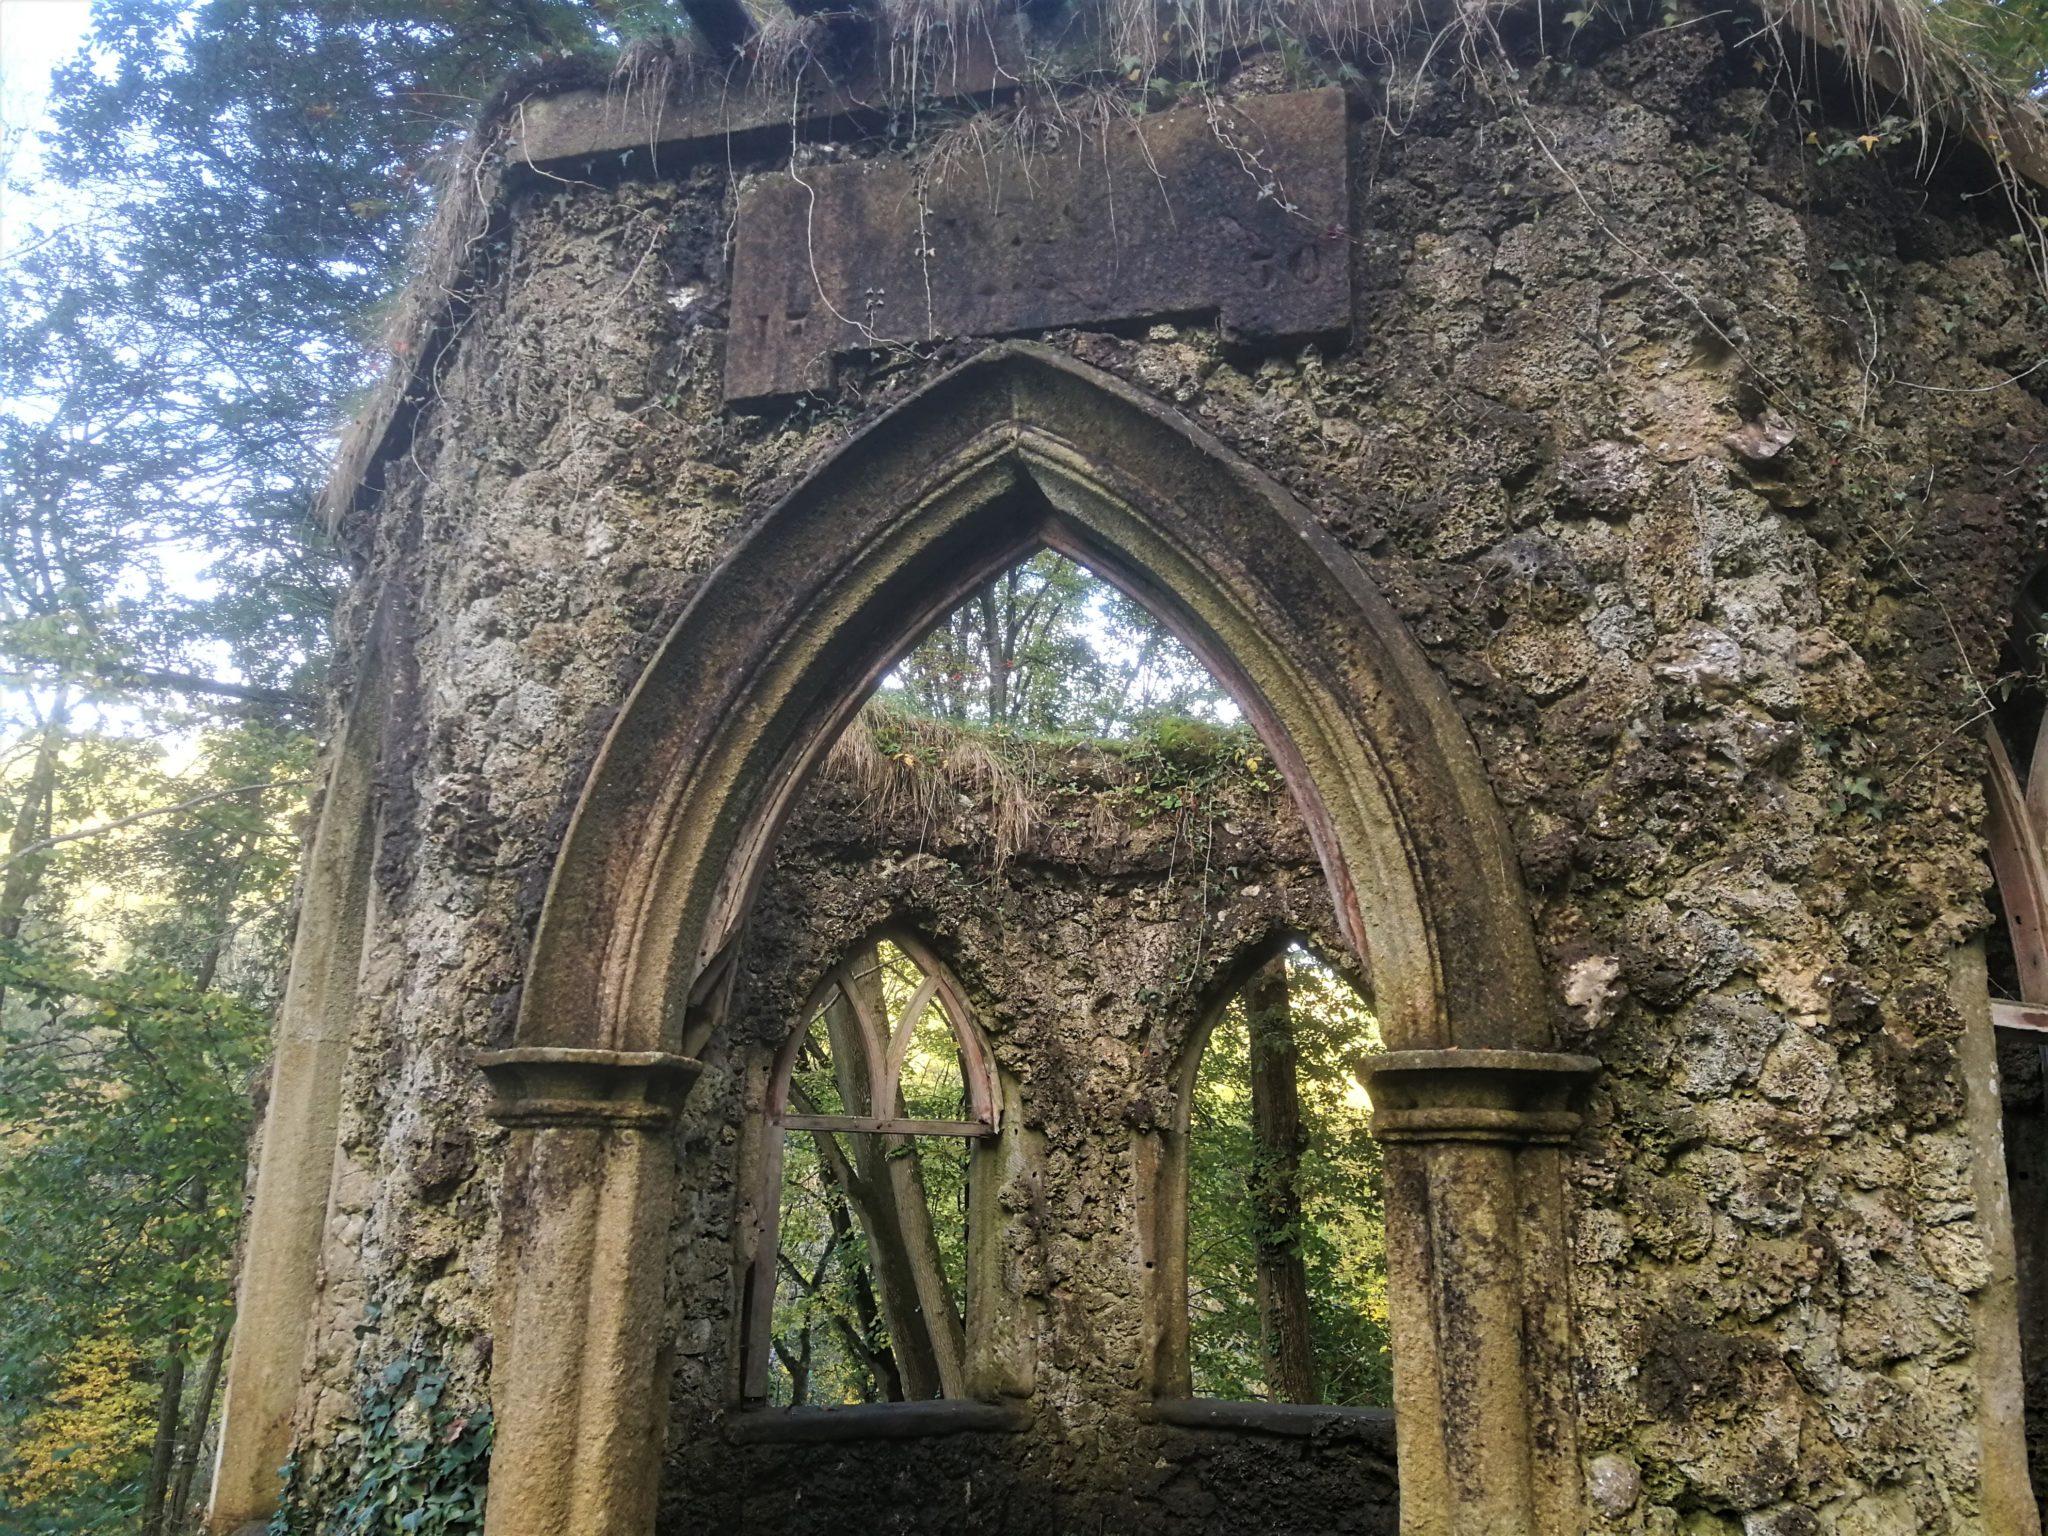 Visit Hackfall – England's best folly landscape?